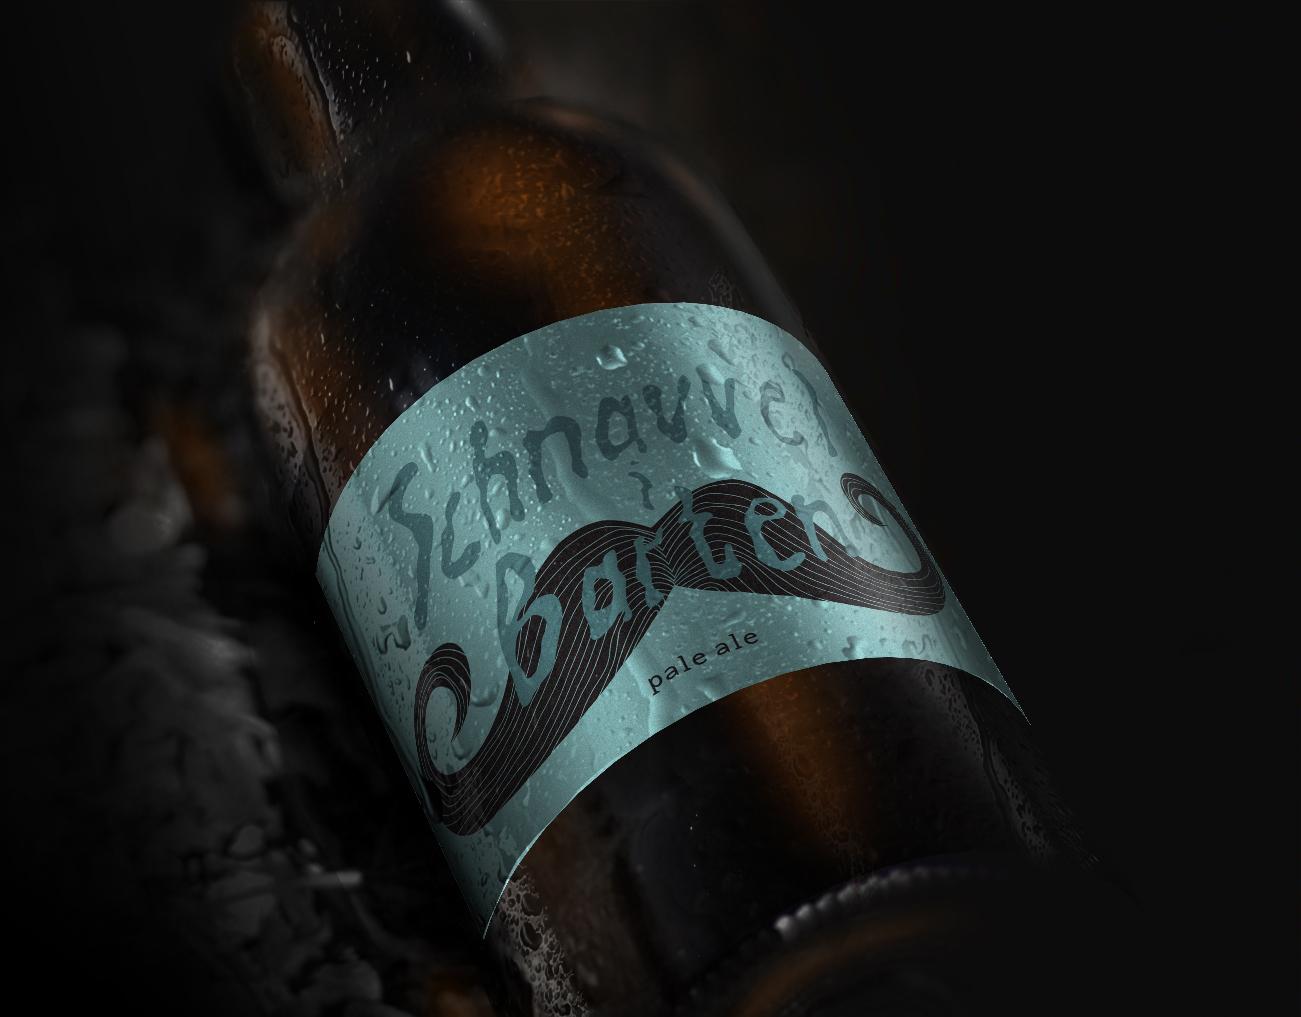 Schnavel i Barten, Pale Ale